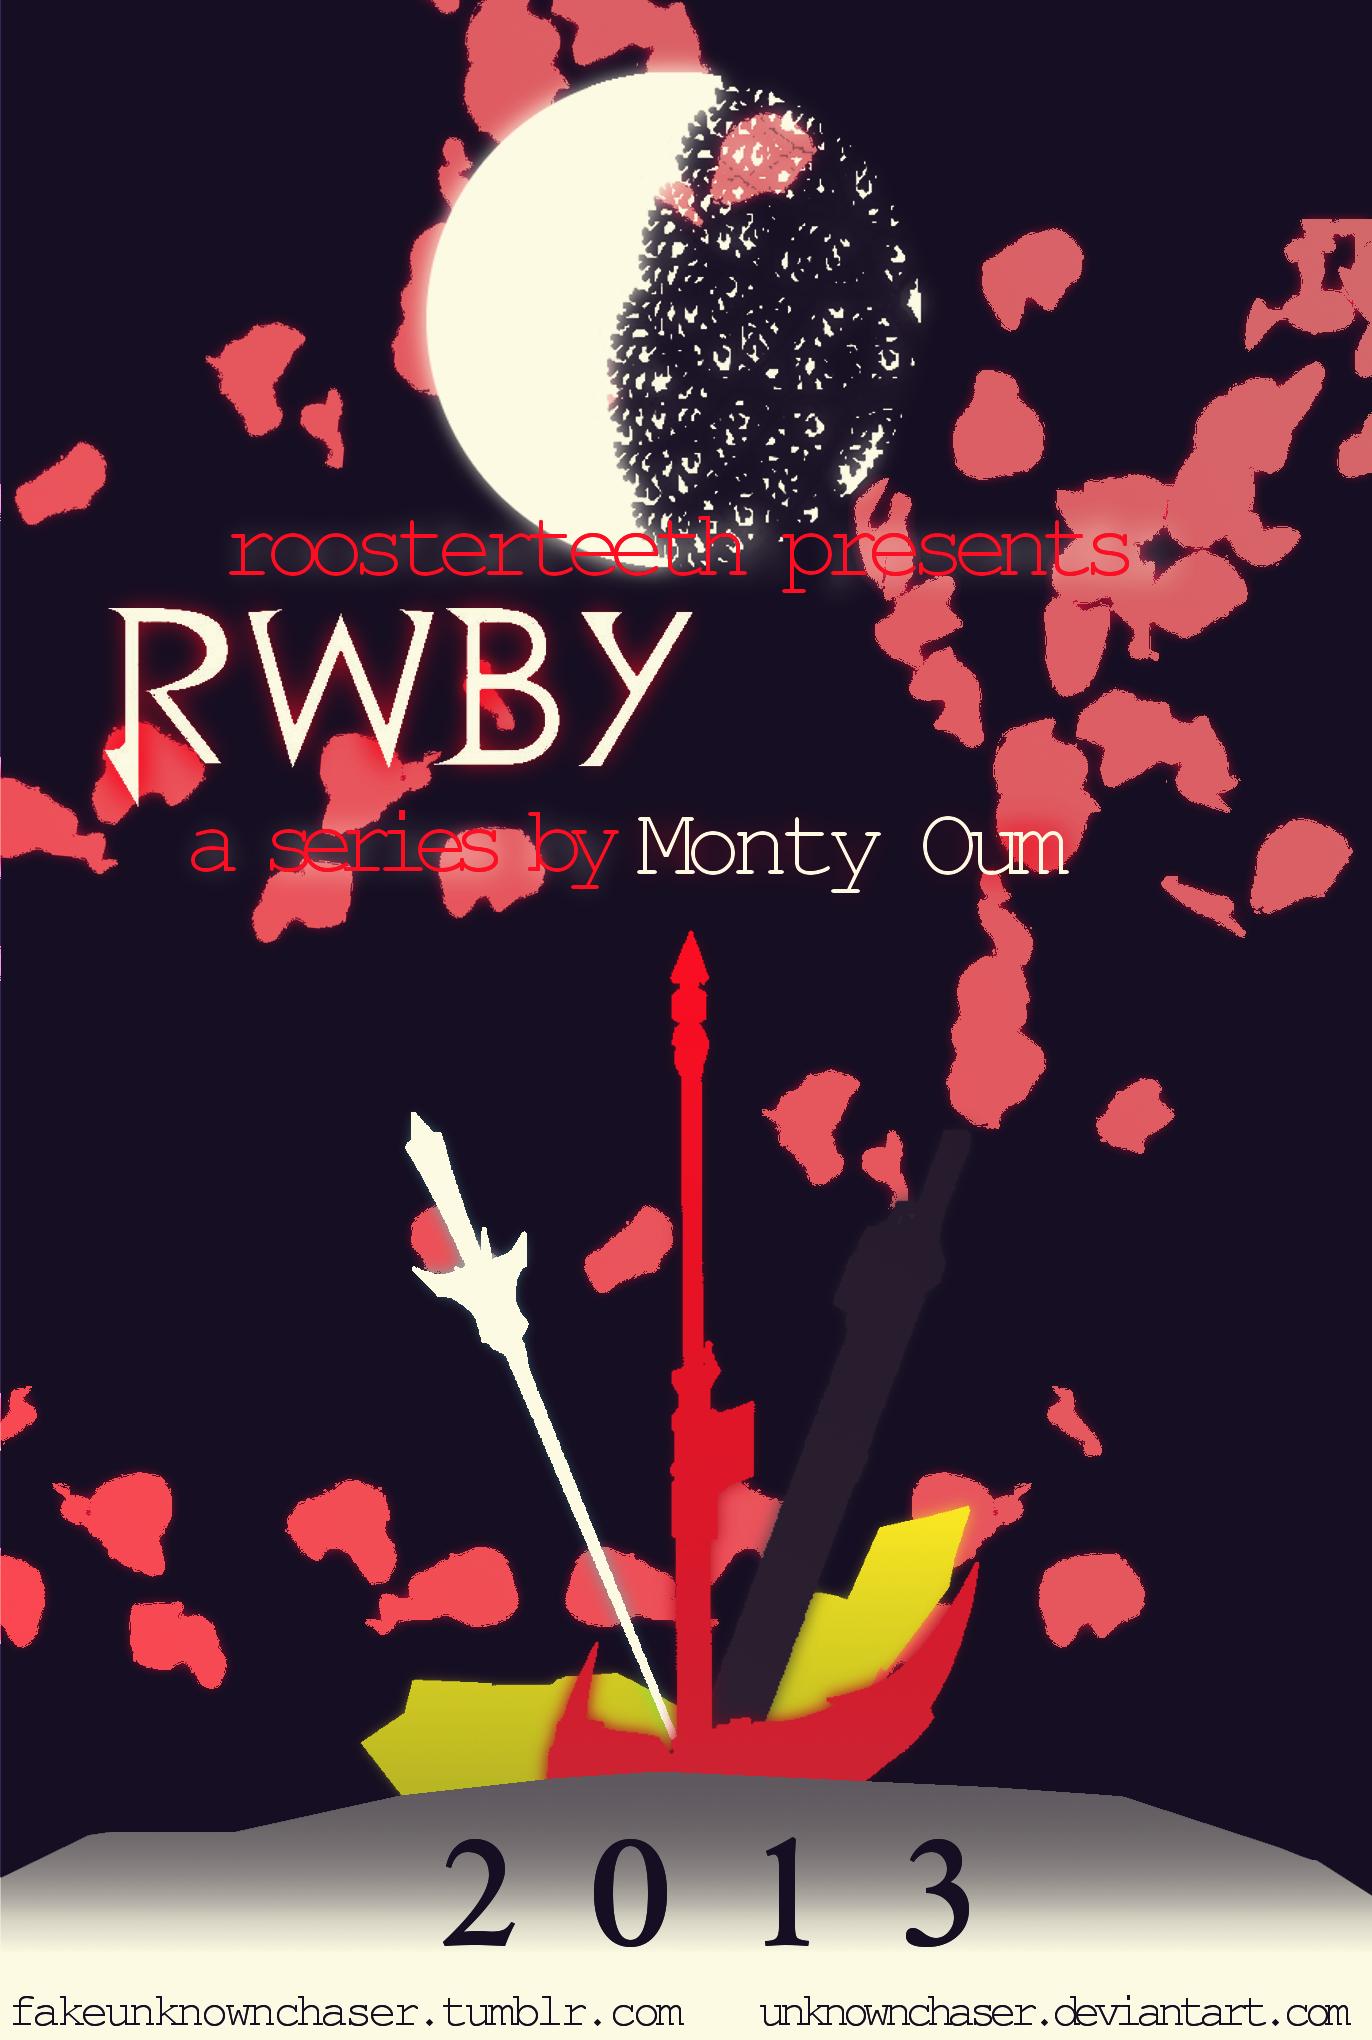 Poster design deviantart - Rwby Poster Design By Unknownchaser Rwby Poster Design By Unknownchaser